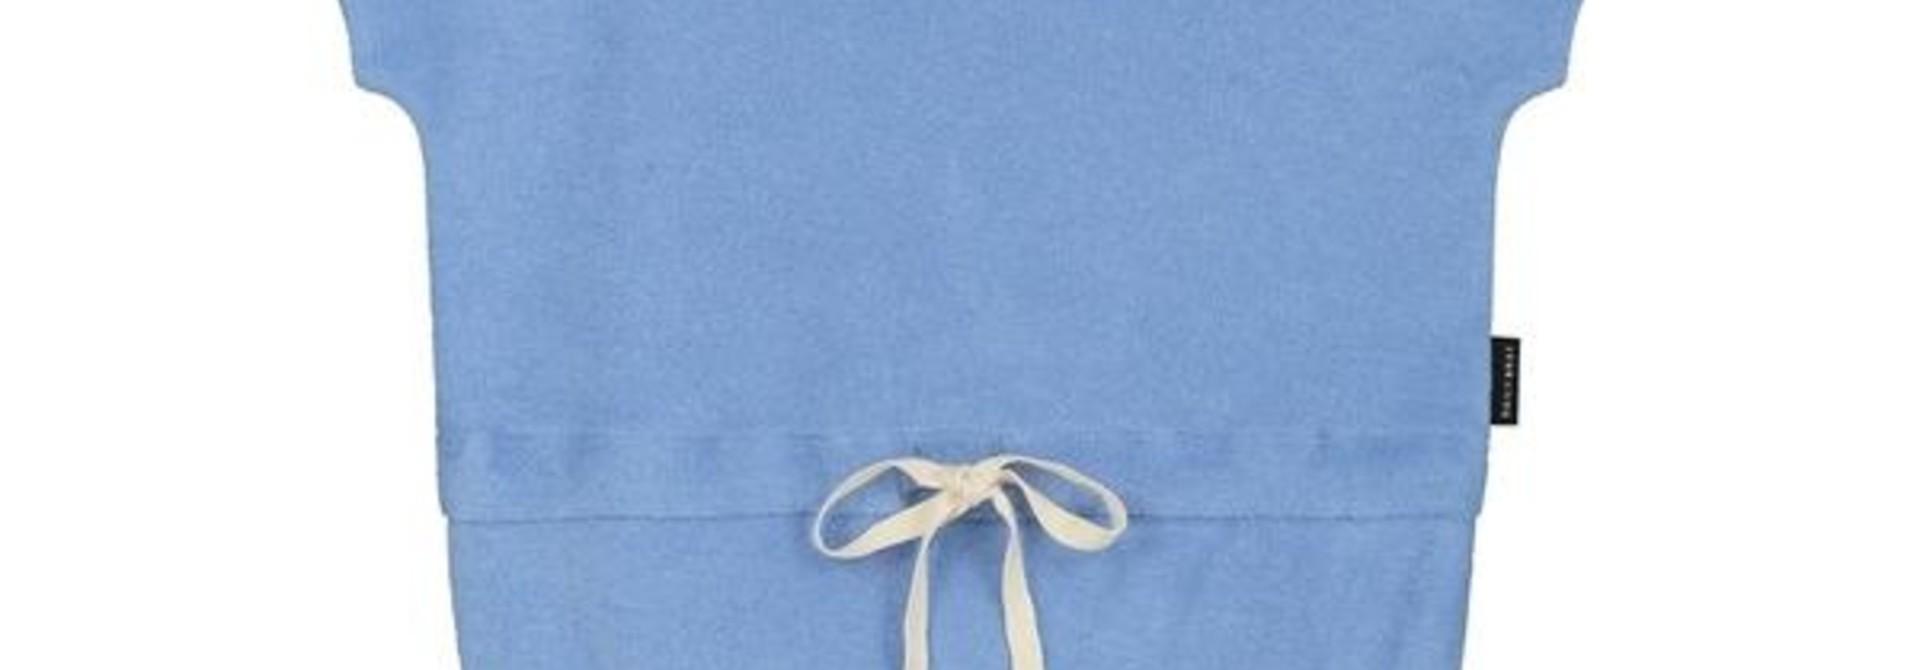 Joe suit serenity blue